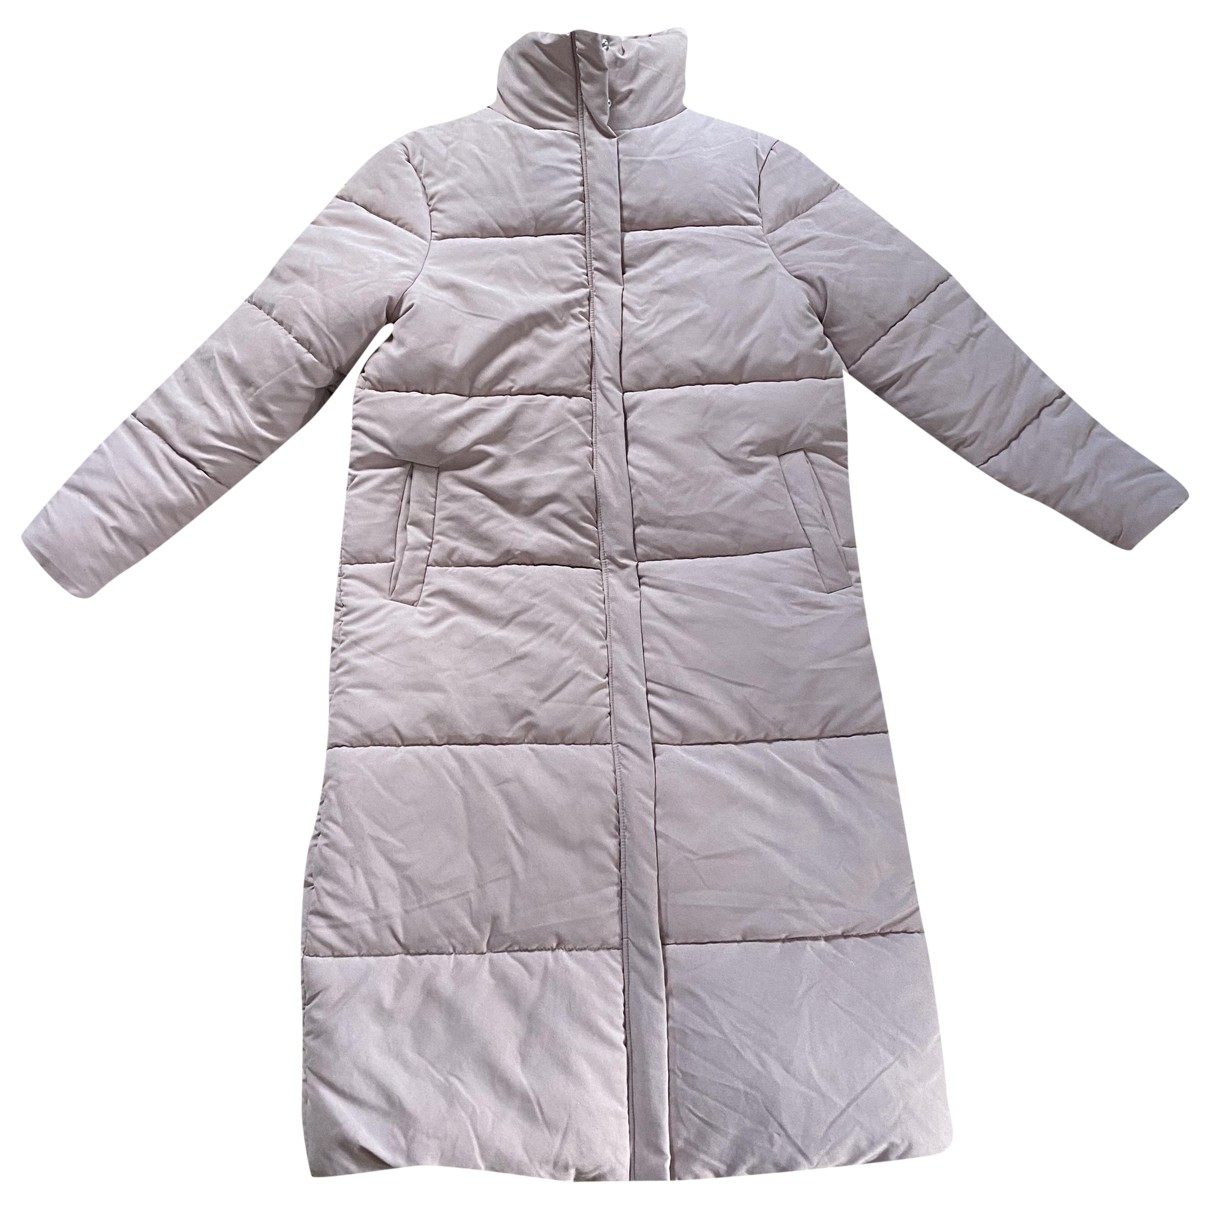 Aéryne \N Pink coat for Women XS International